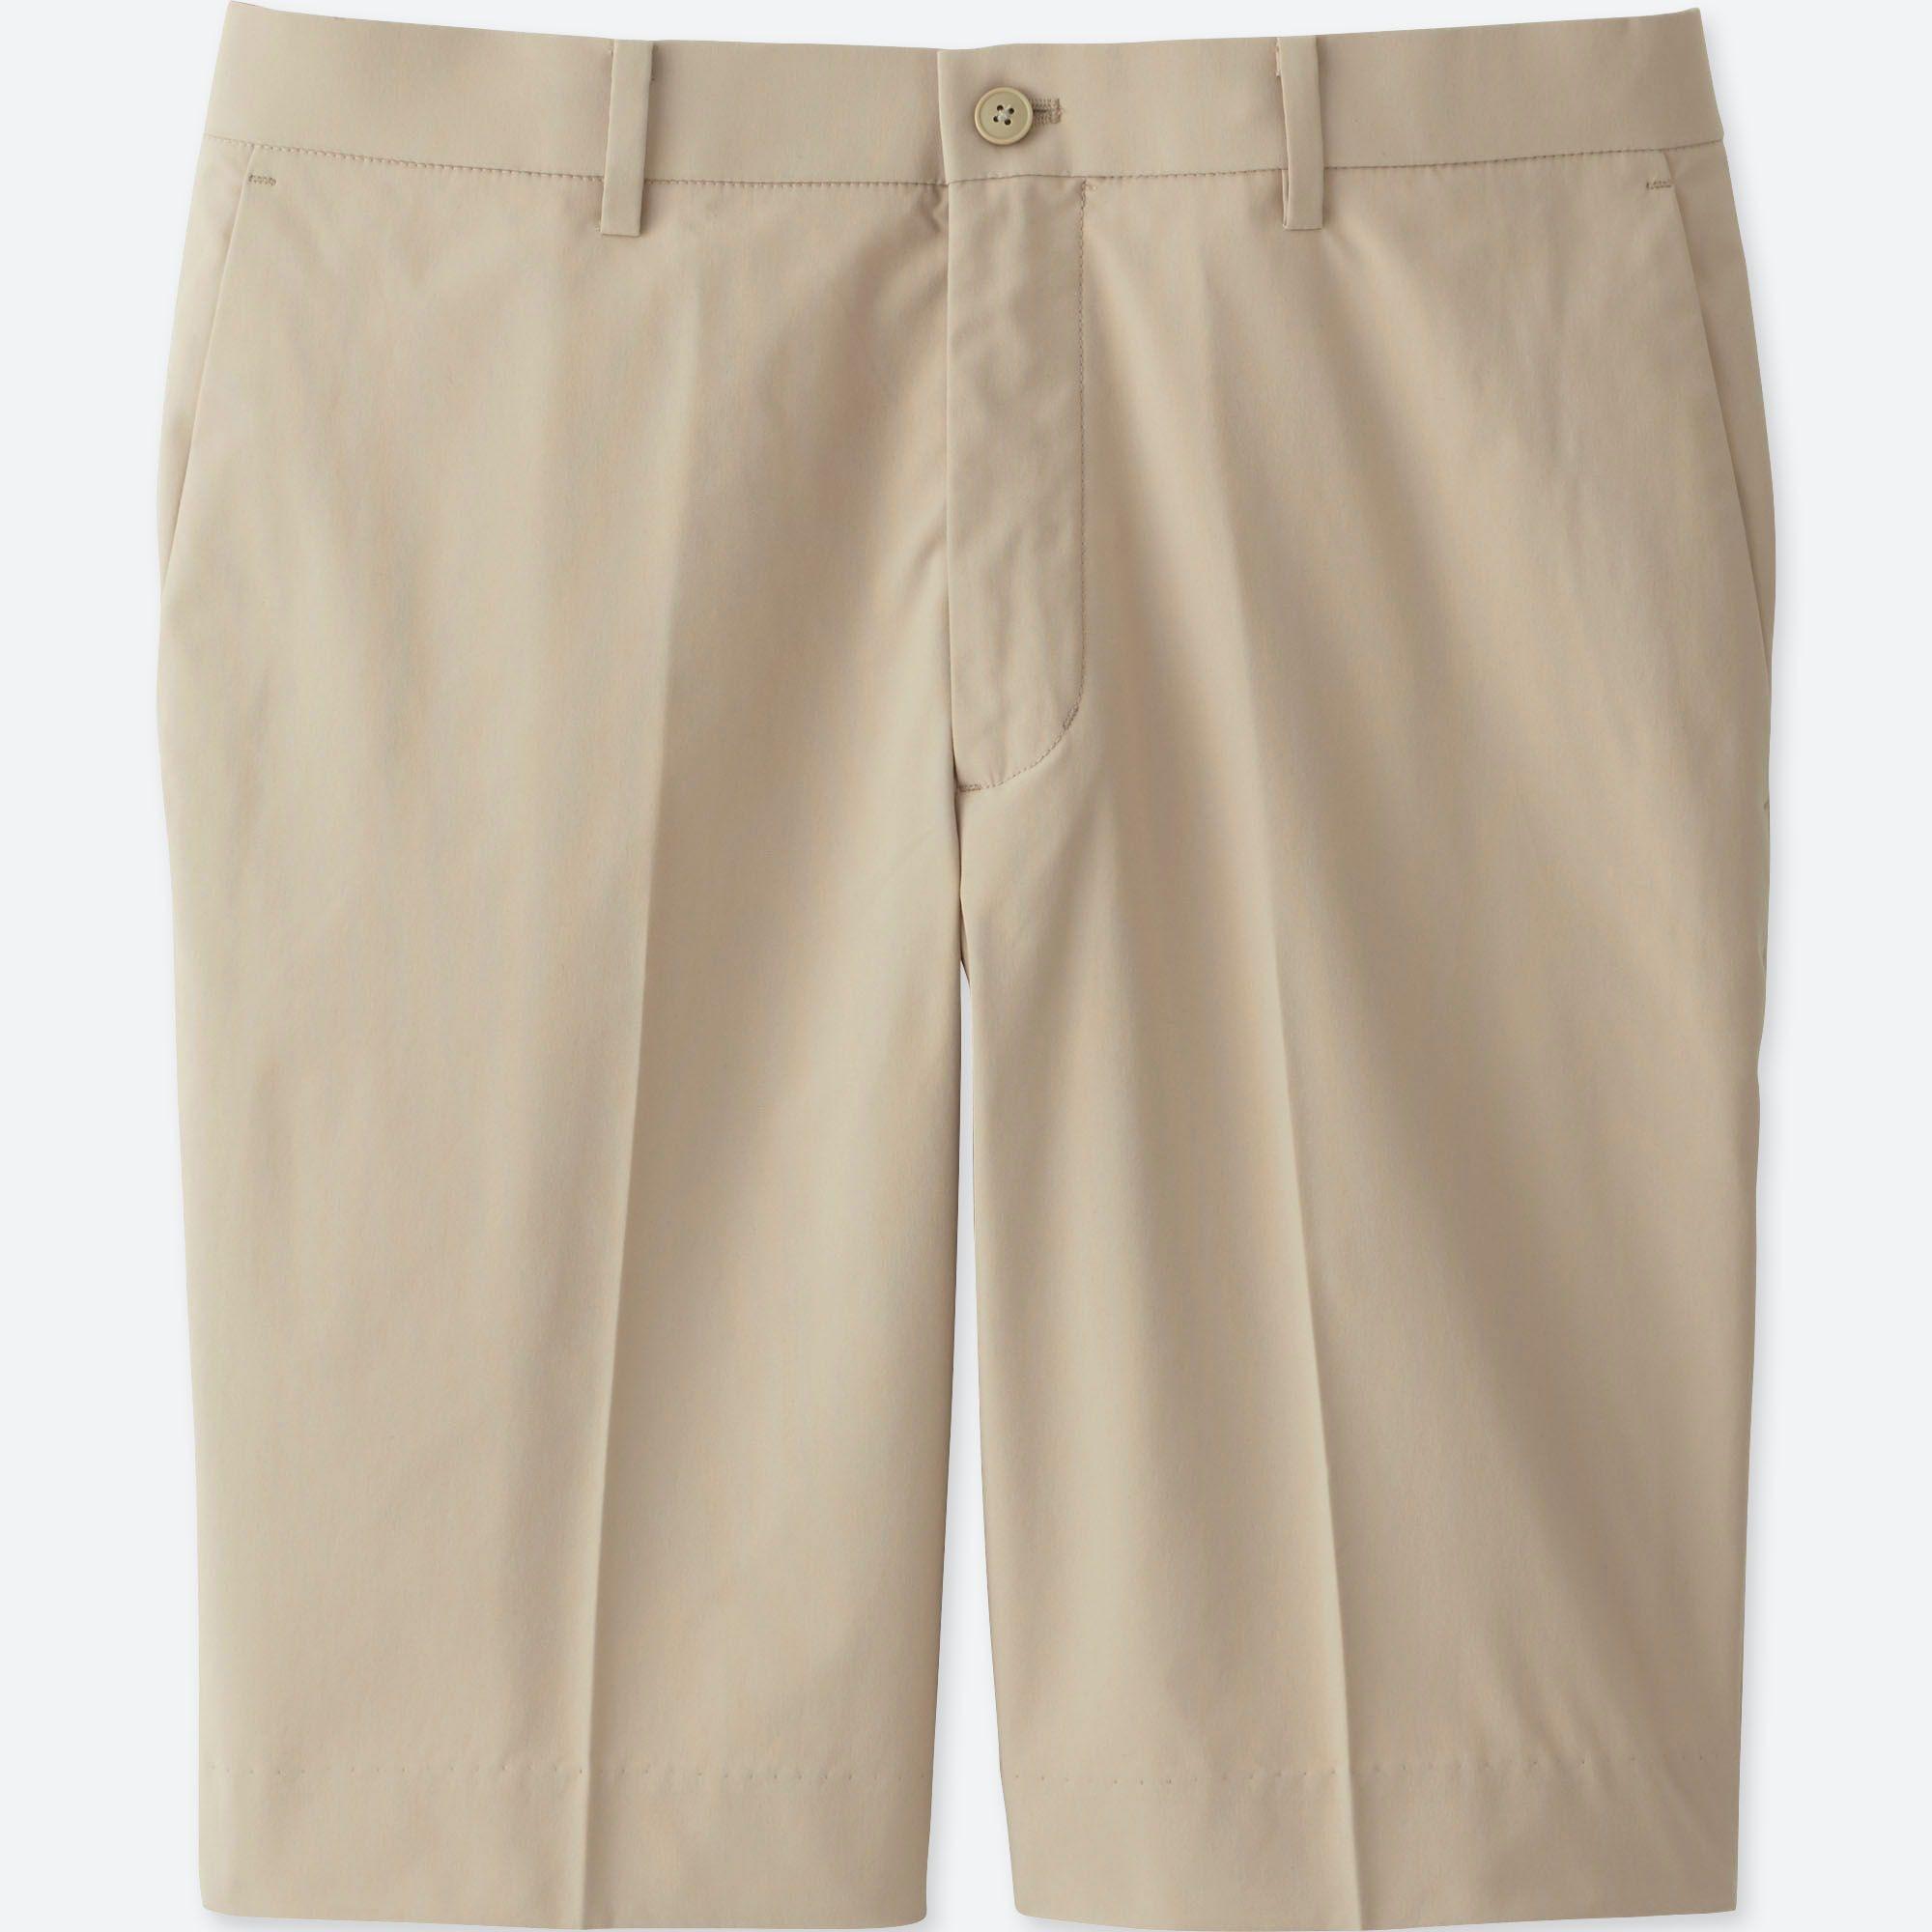 946f173521 Men DRY Stretch (KANDO) Active Shorts | UNIQLO US